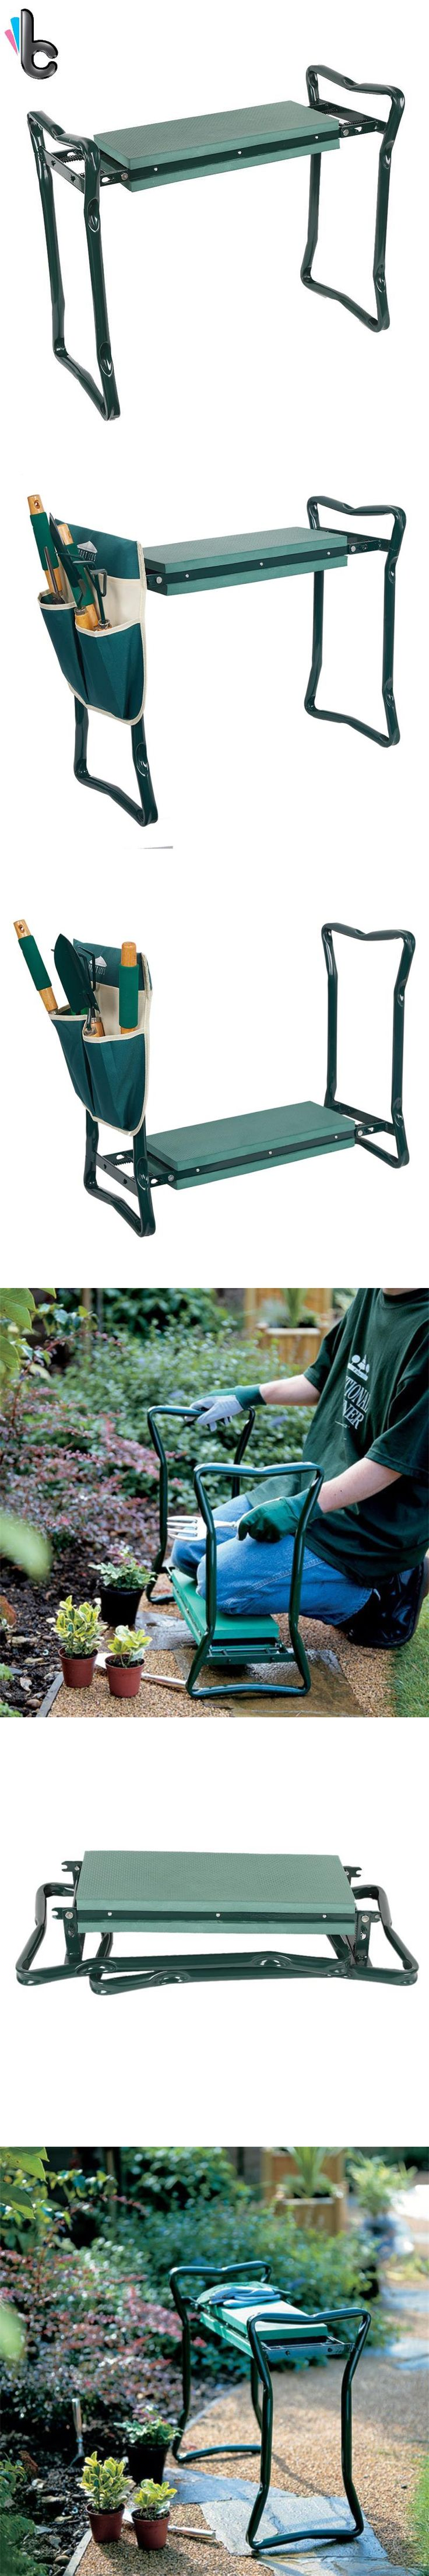 Garden Chair Garden Stool Folding Stainless Steel Garden Kneeler Stool with EVA Kneeling Pad Gardening Portable Tool